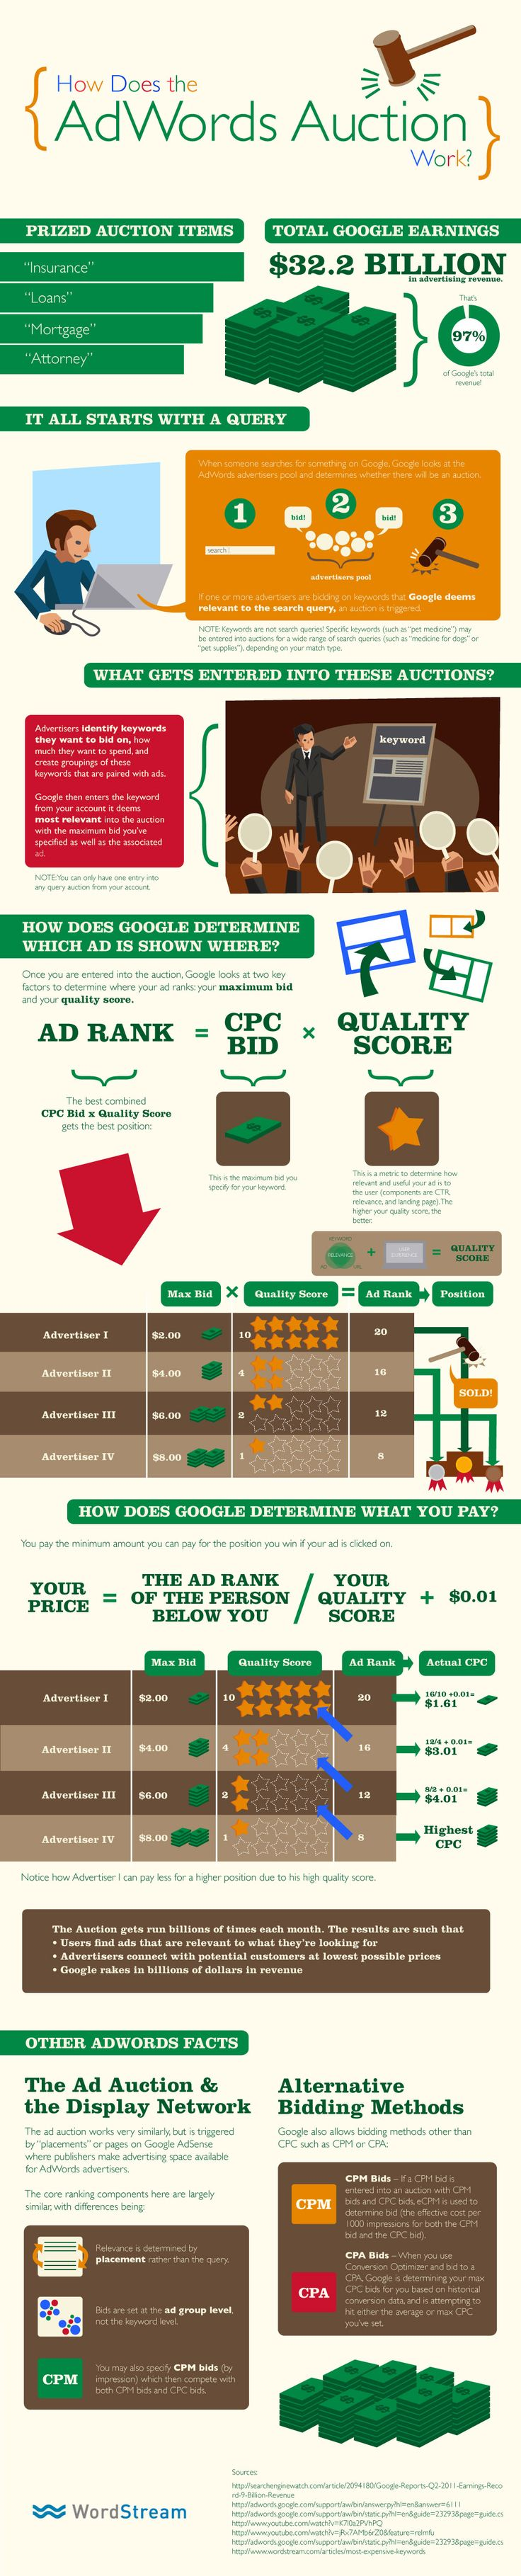 Google Adwords Processes